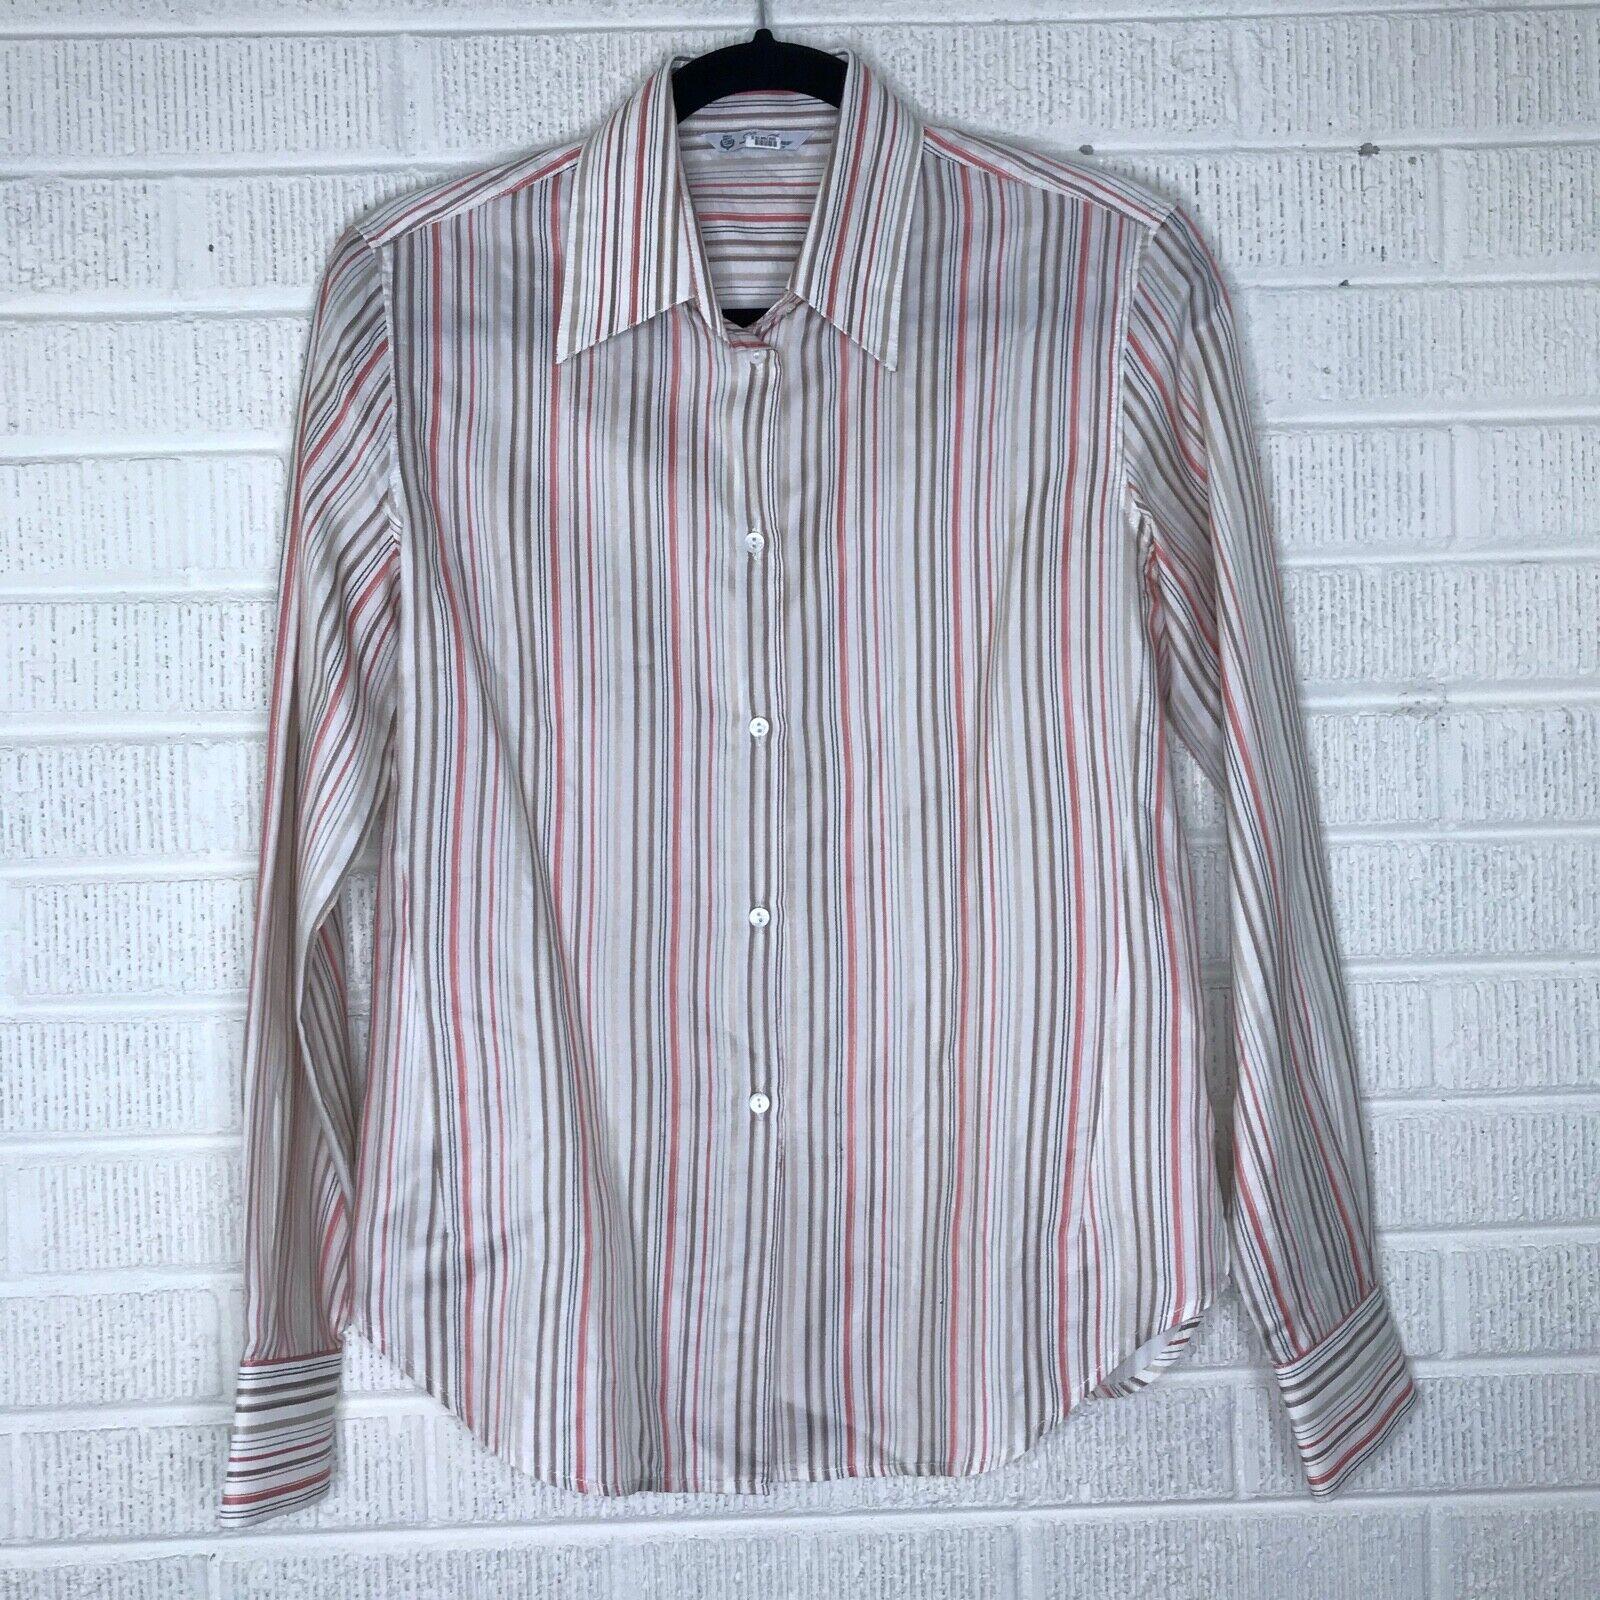 LGold Piana Größe 42 Silk Striped Button Down Blouse Top Long sleeve Cream EUC